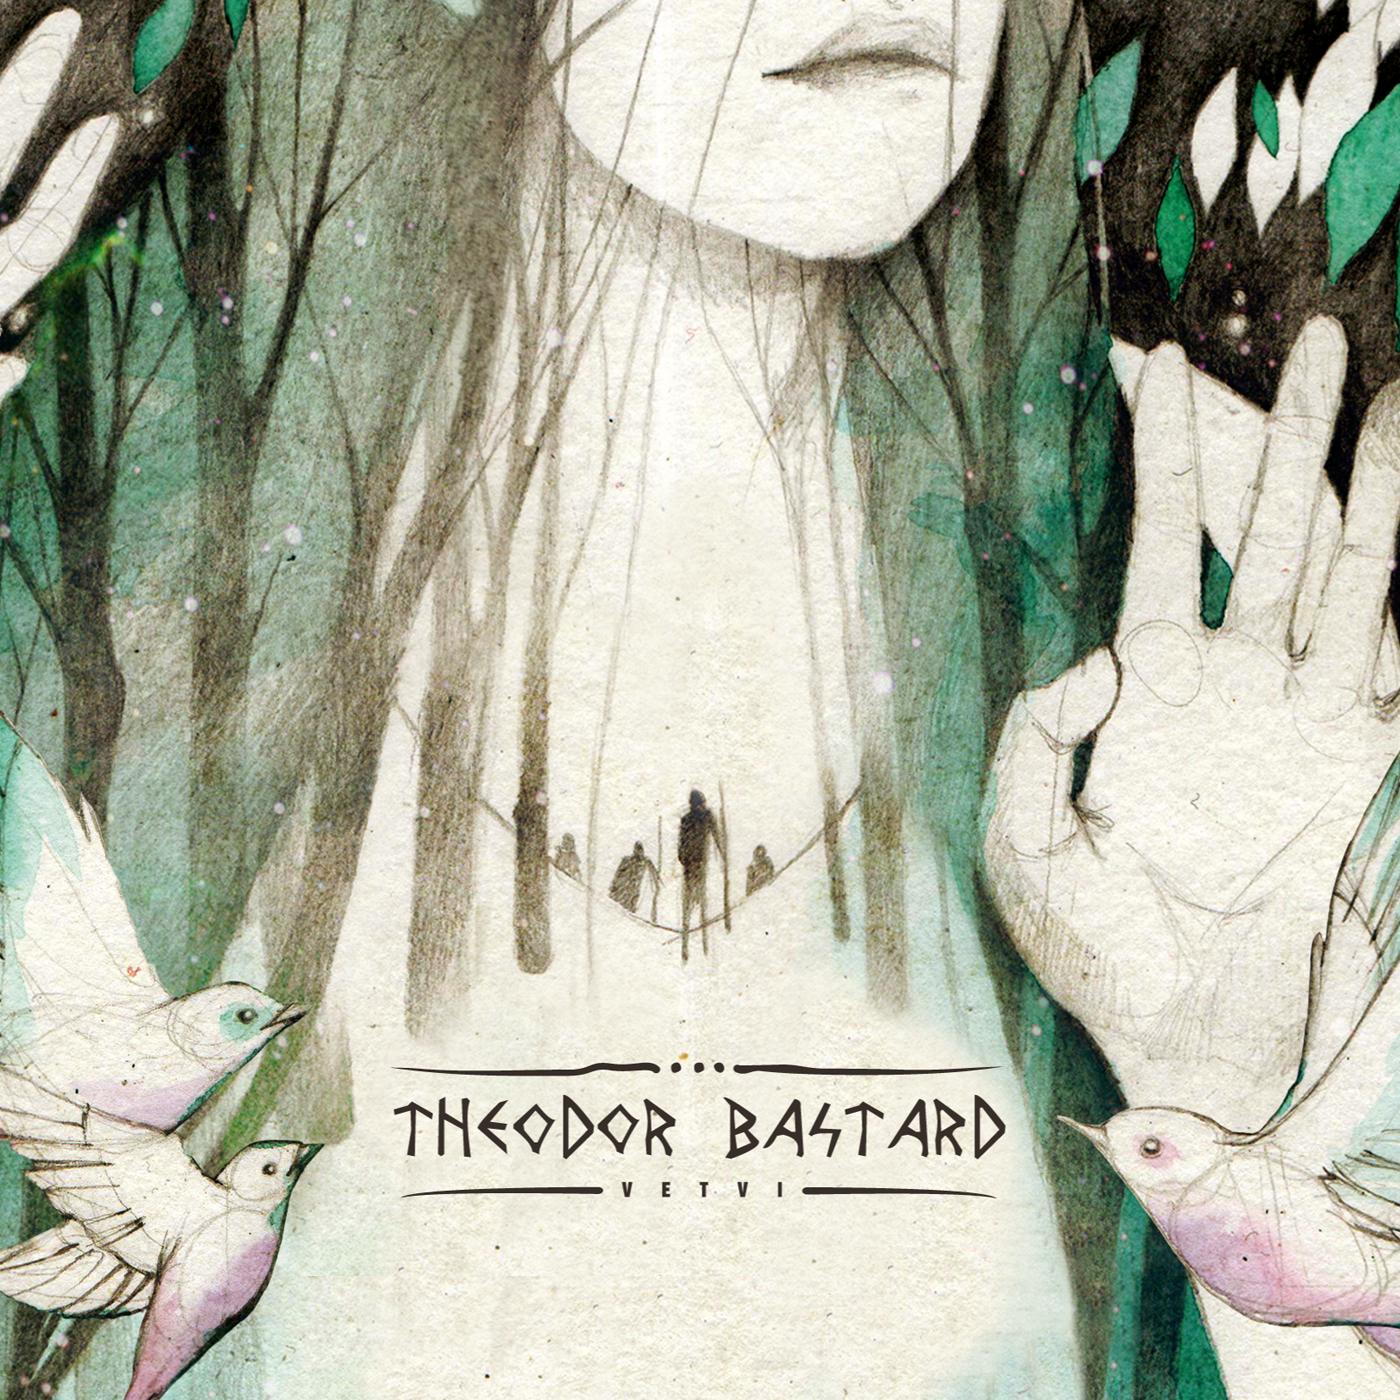 Theodor Bastard – Vetvi